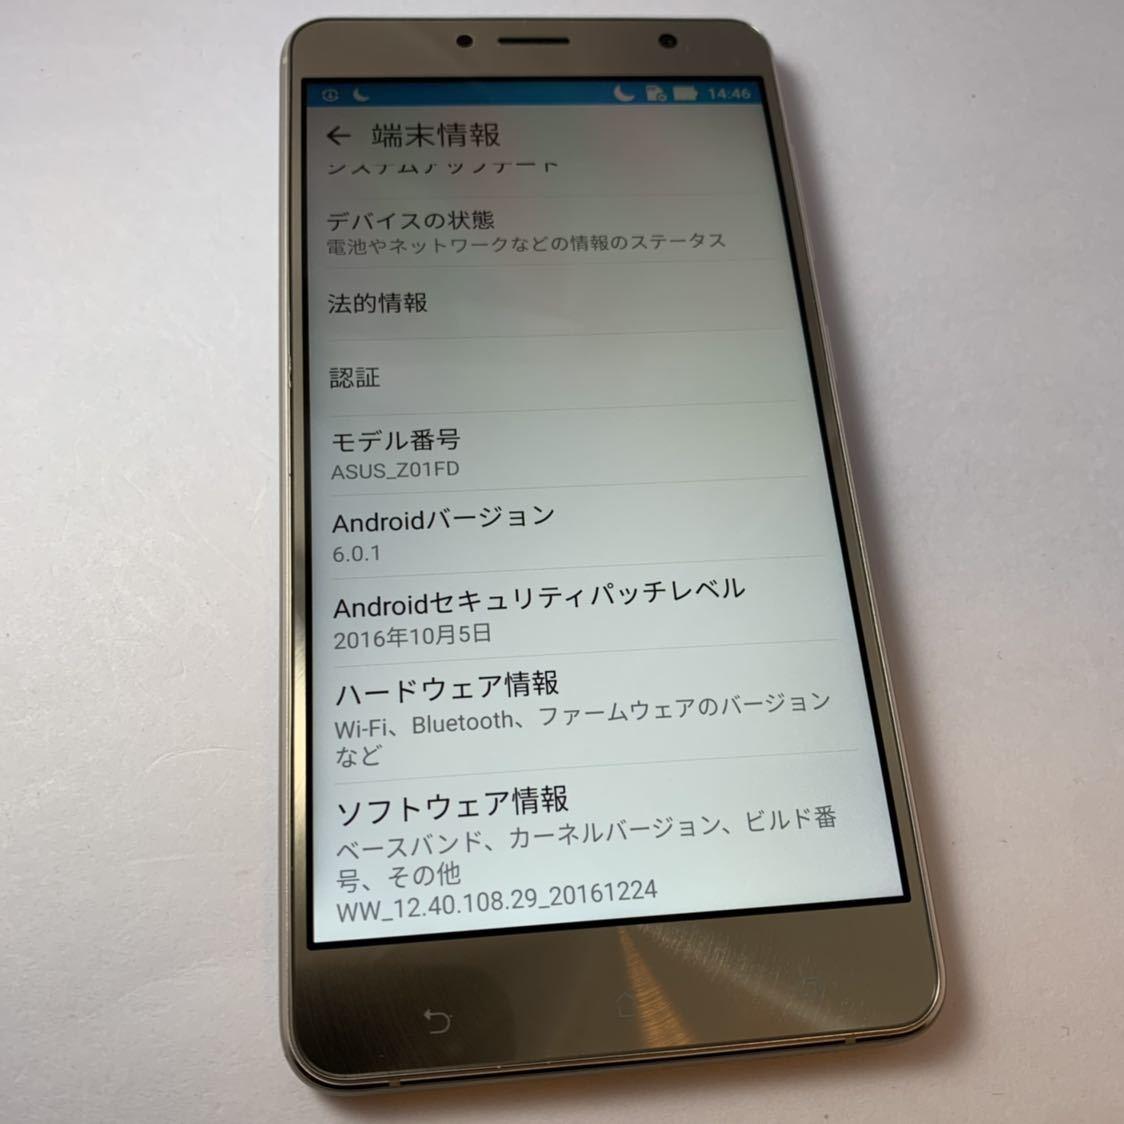 ASUS Zenfone 3 Deluxe 5.5 ZS550KL 64GB SIMフリー 本体 Z01FD ゴールド 海外版_画像10